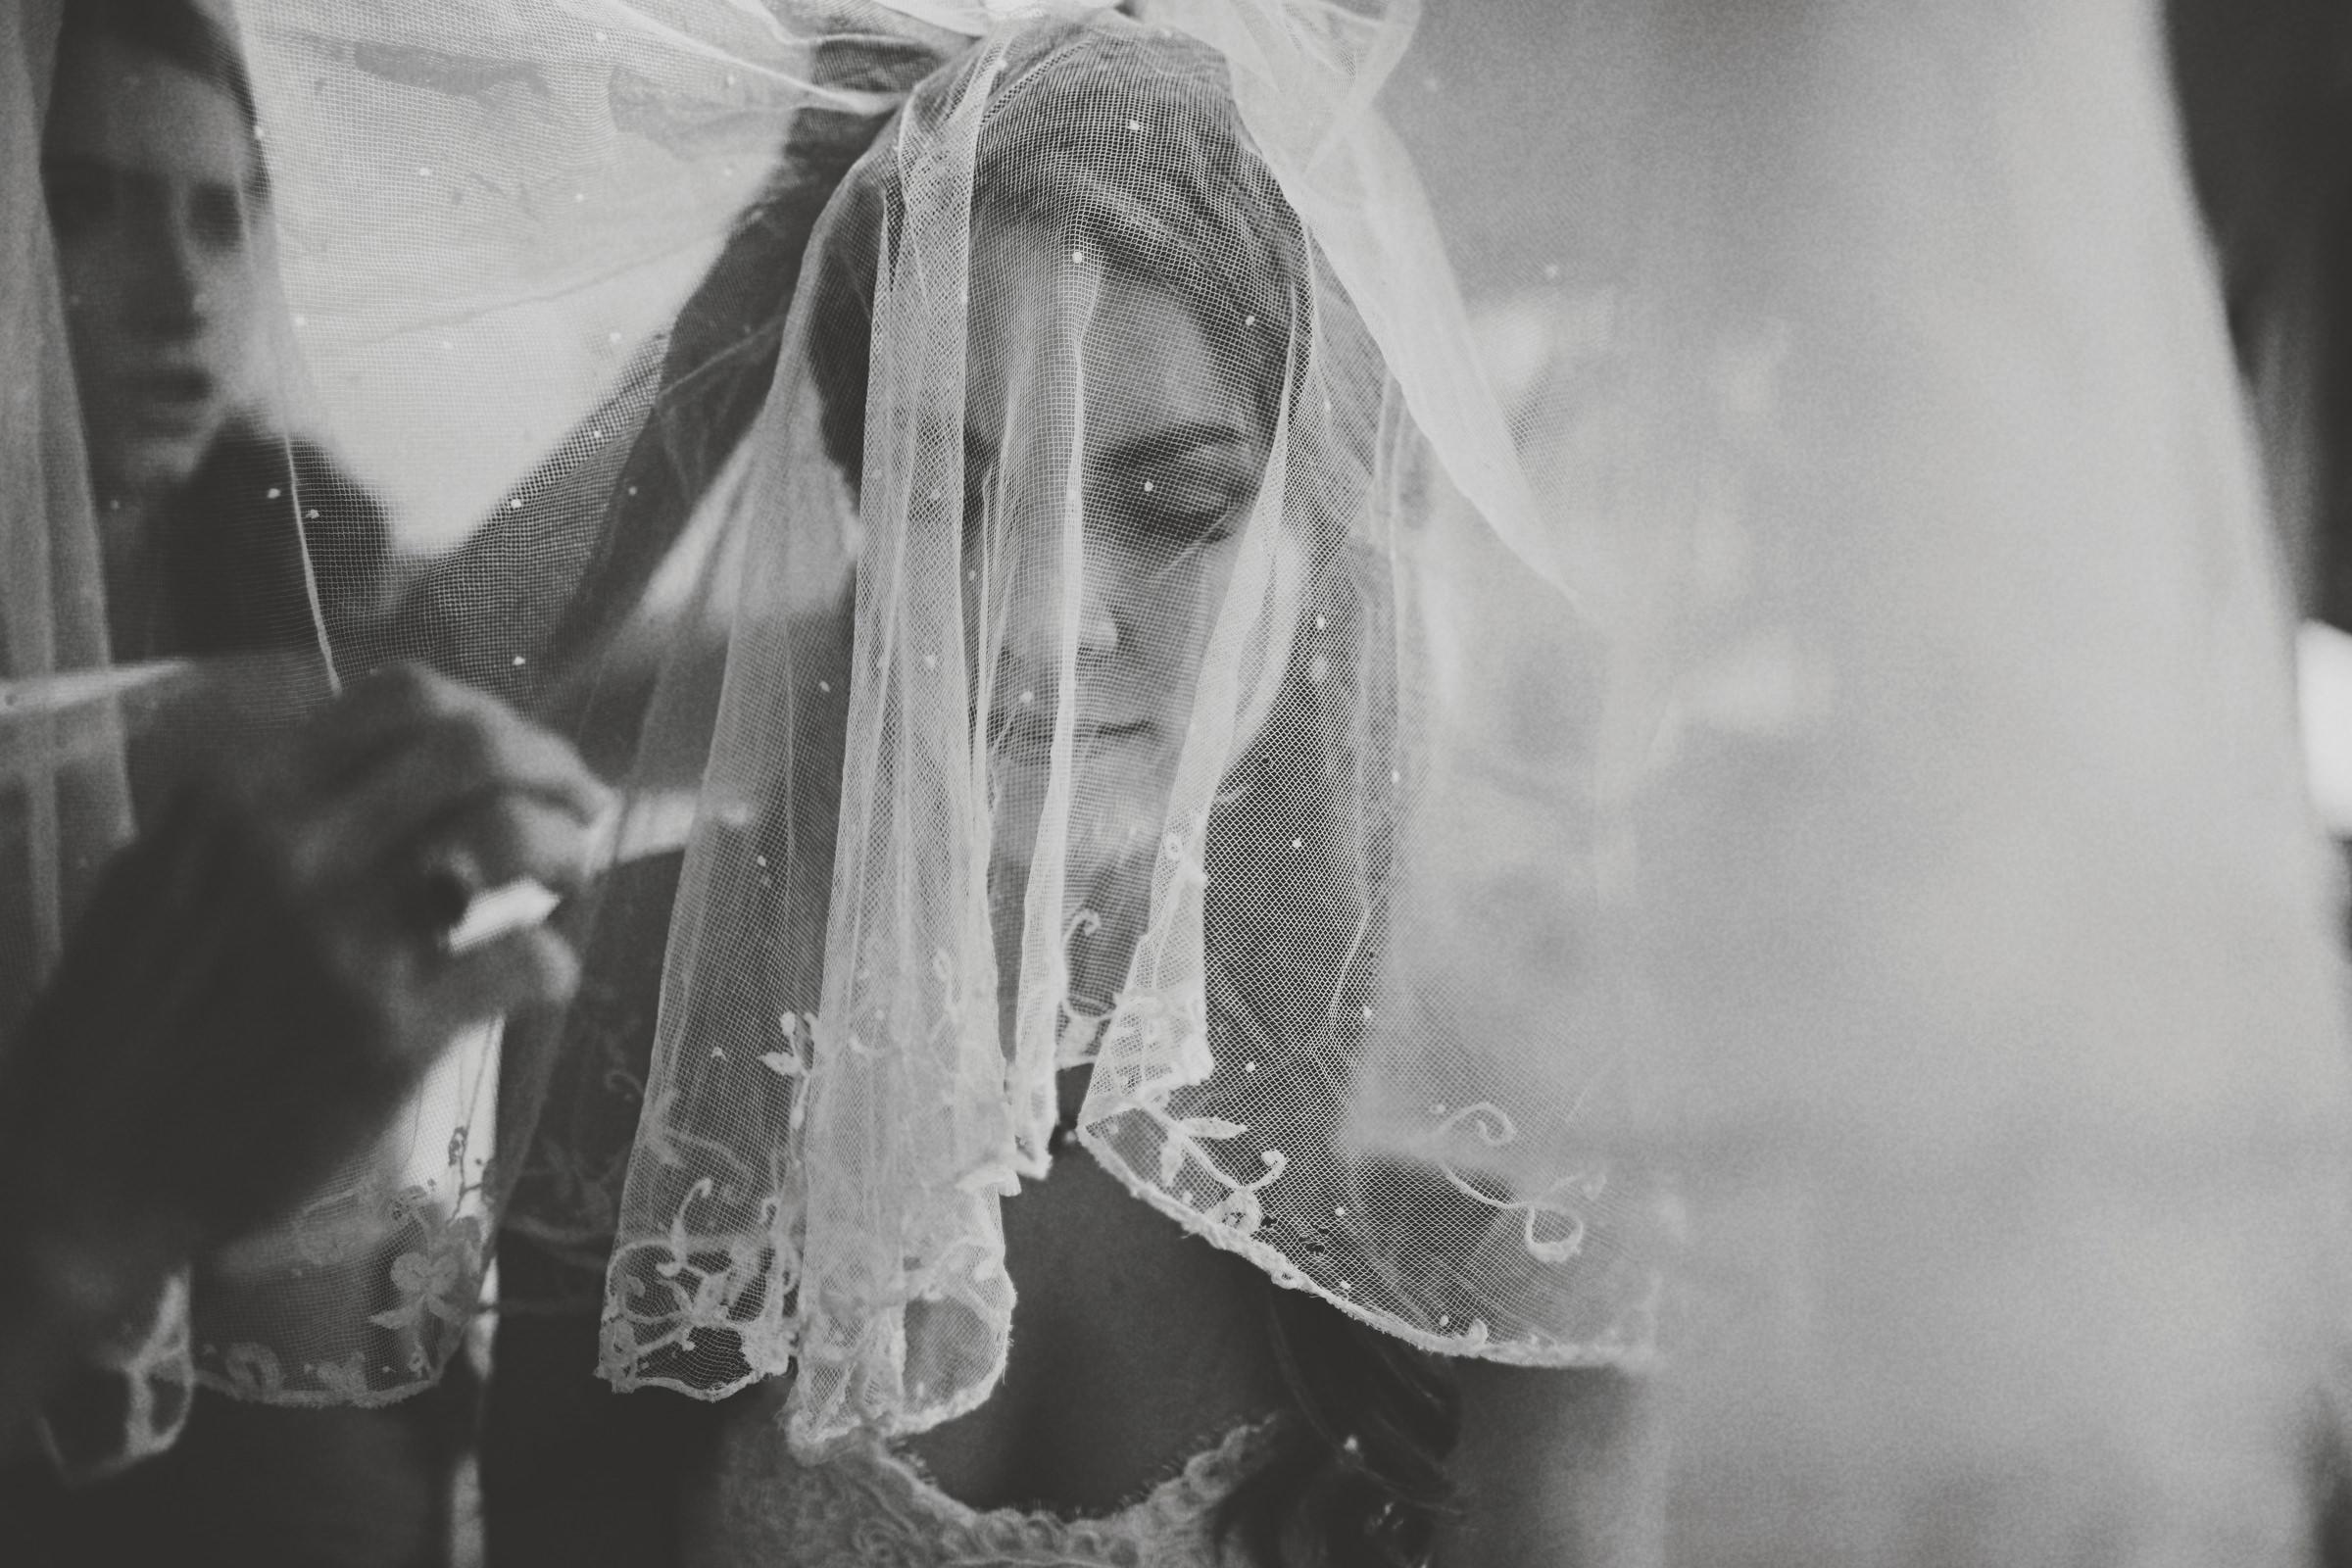 Bride portrait through veil - photo by Jonas Seaman Photography